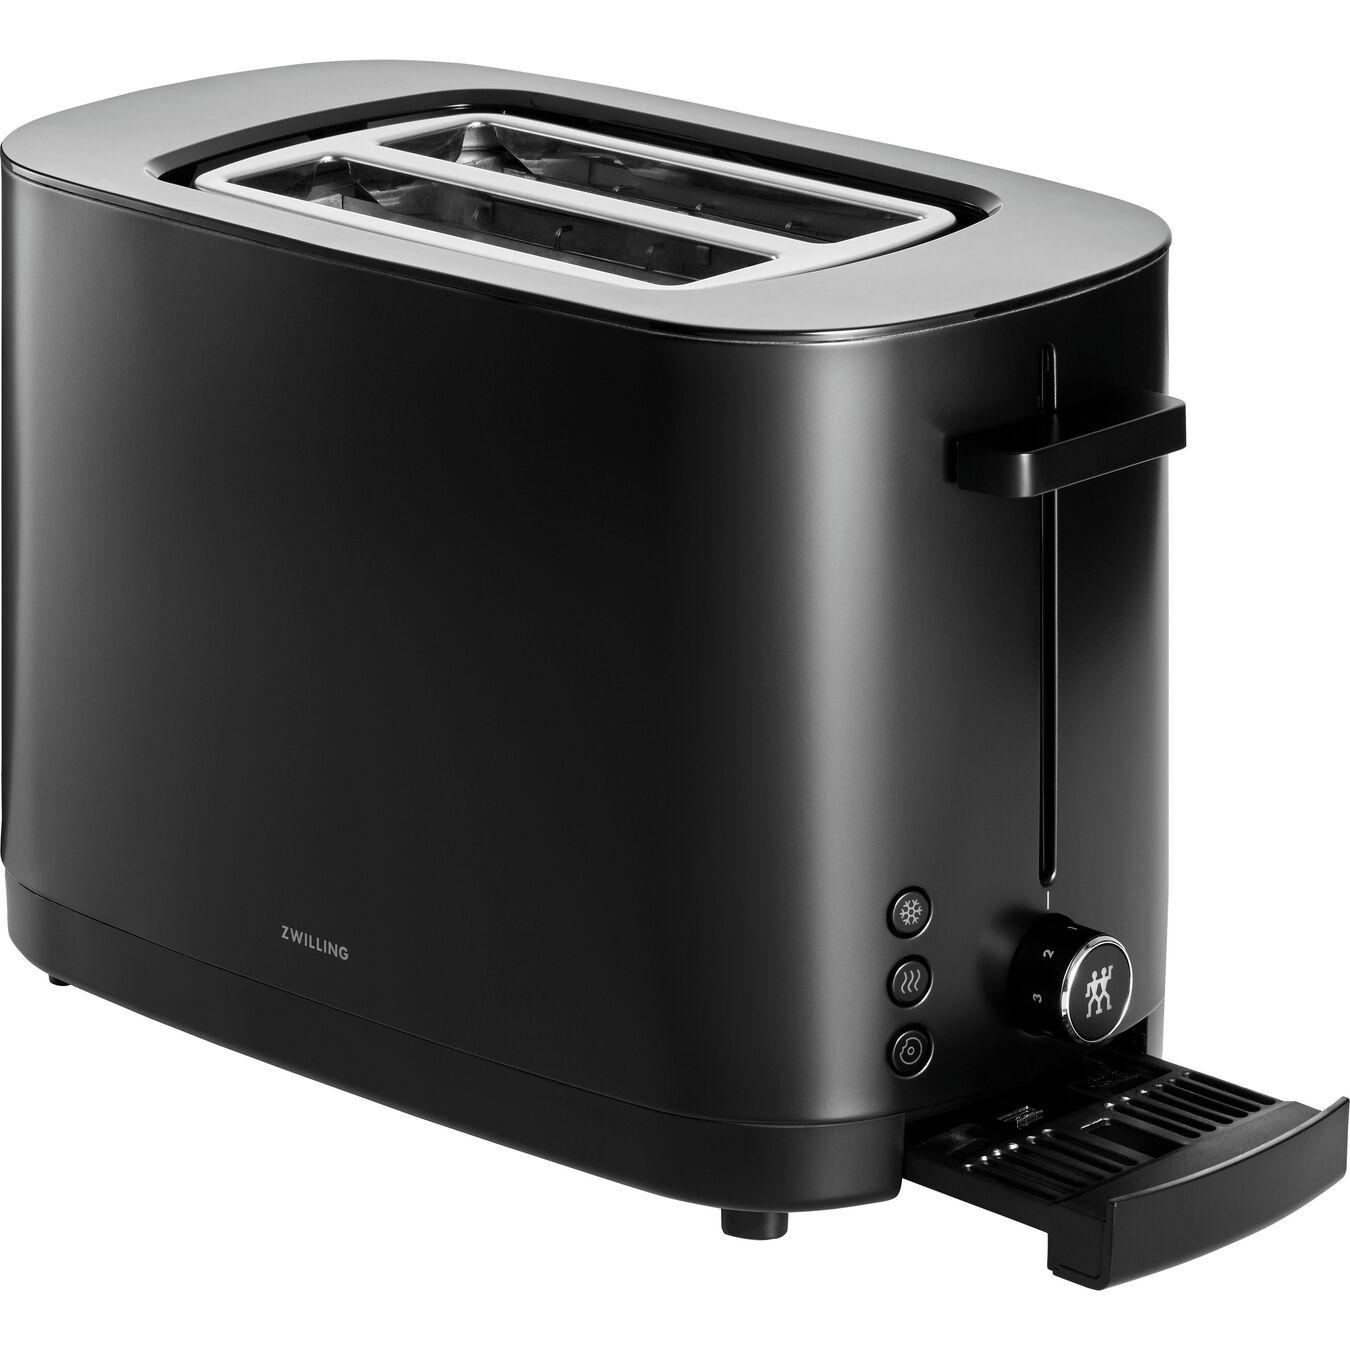 2 Slot Toaster - Black,,large 2